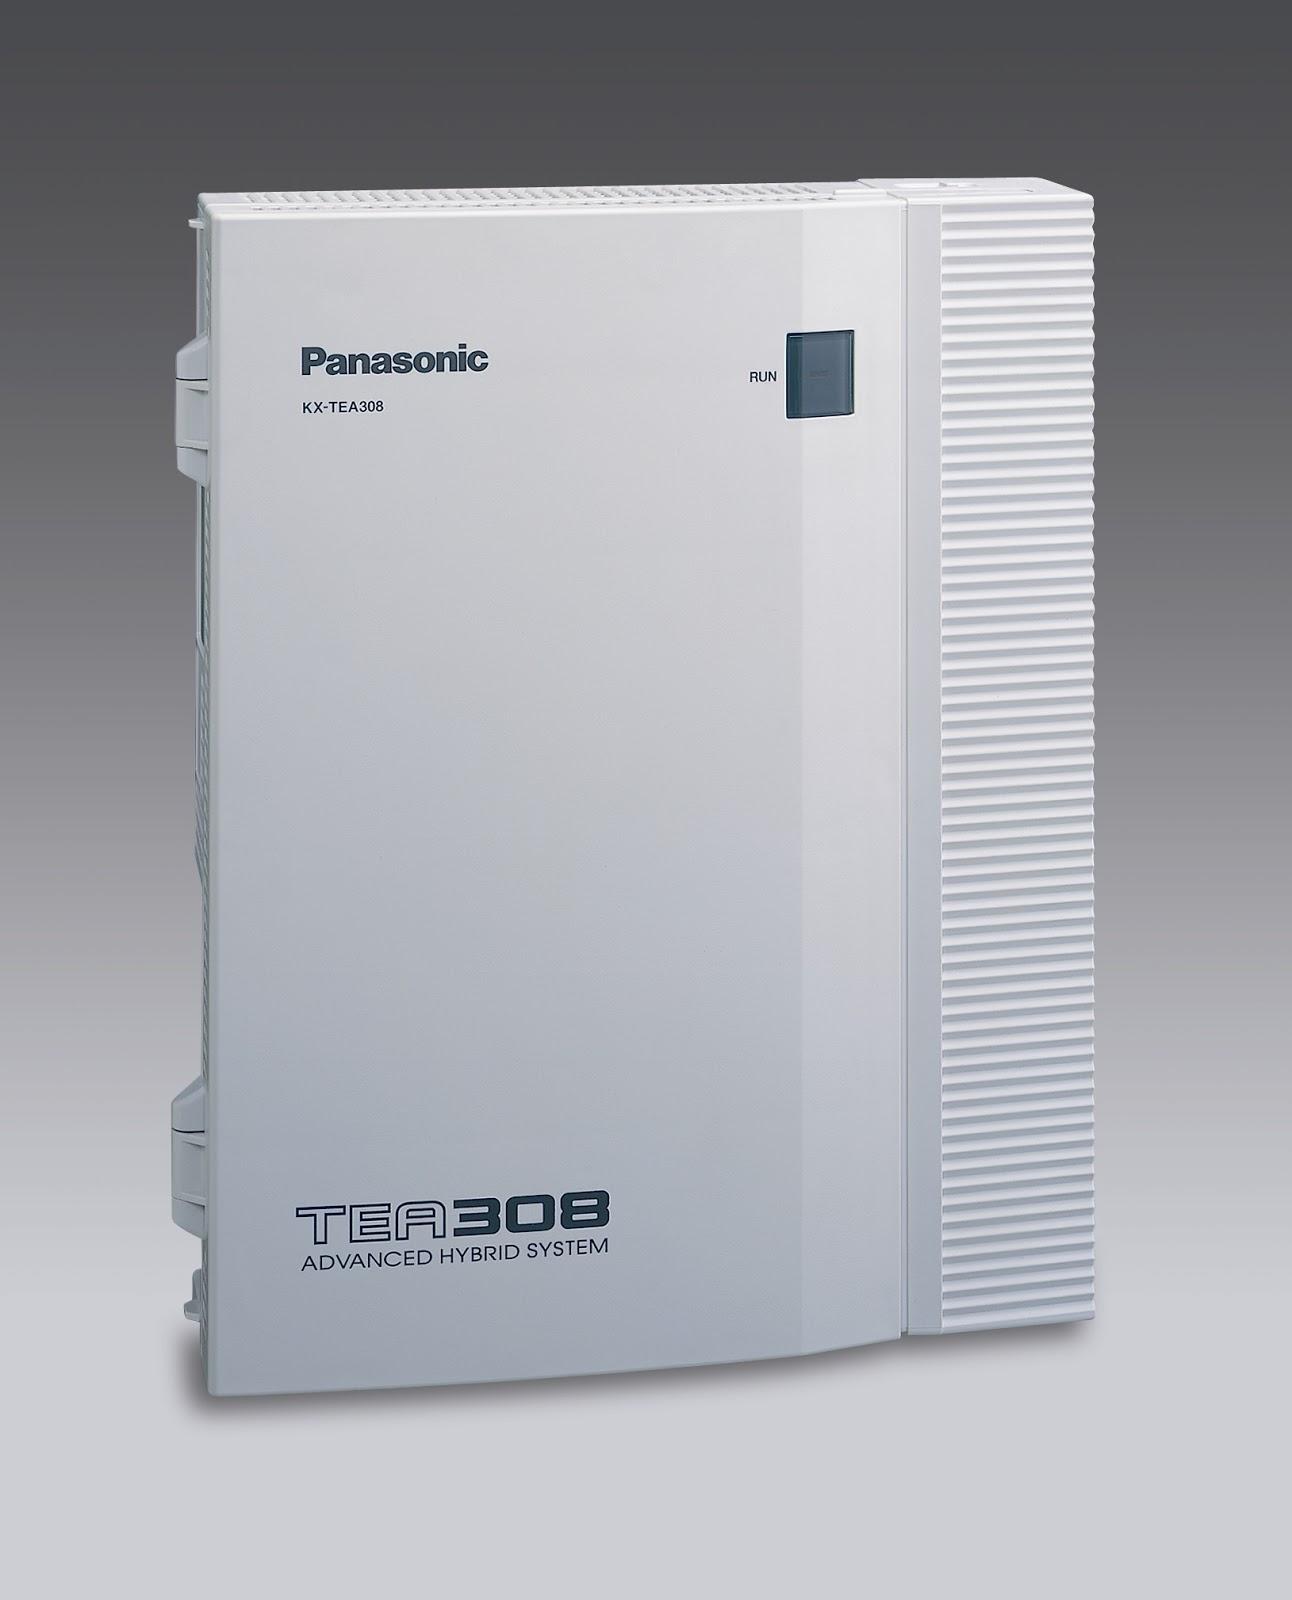 panasonic pbx installation tea308 [ 1292 x 1600 Pixel ]